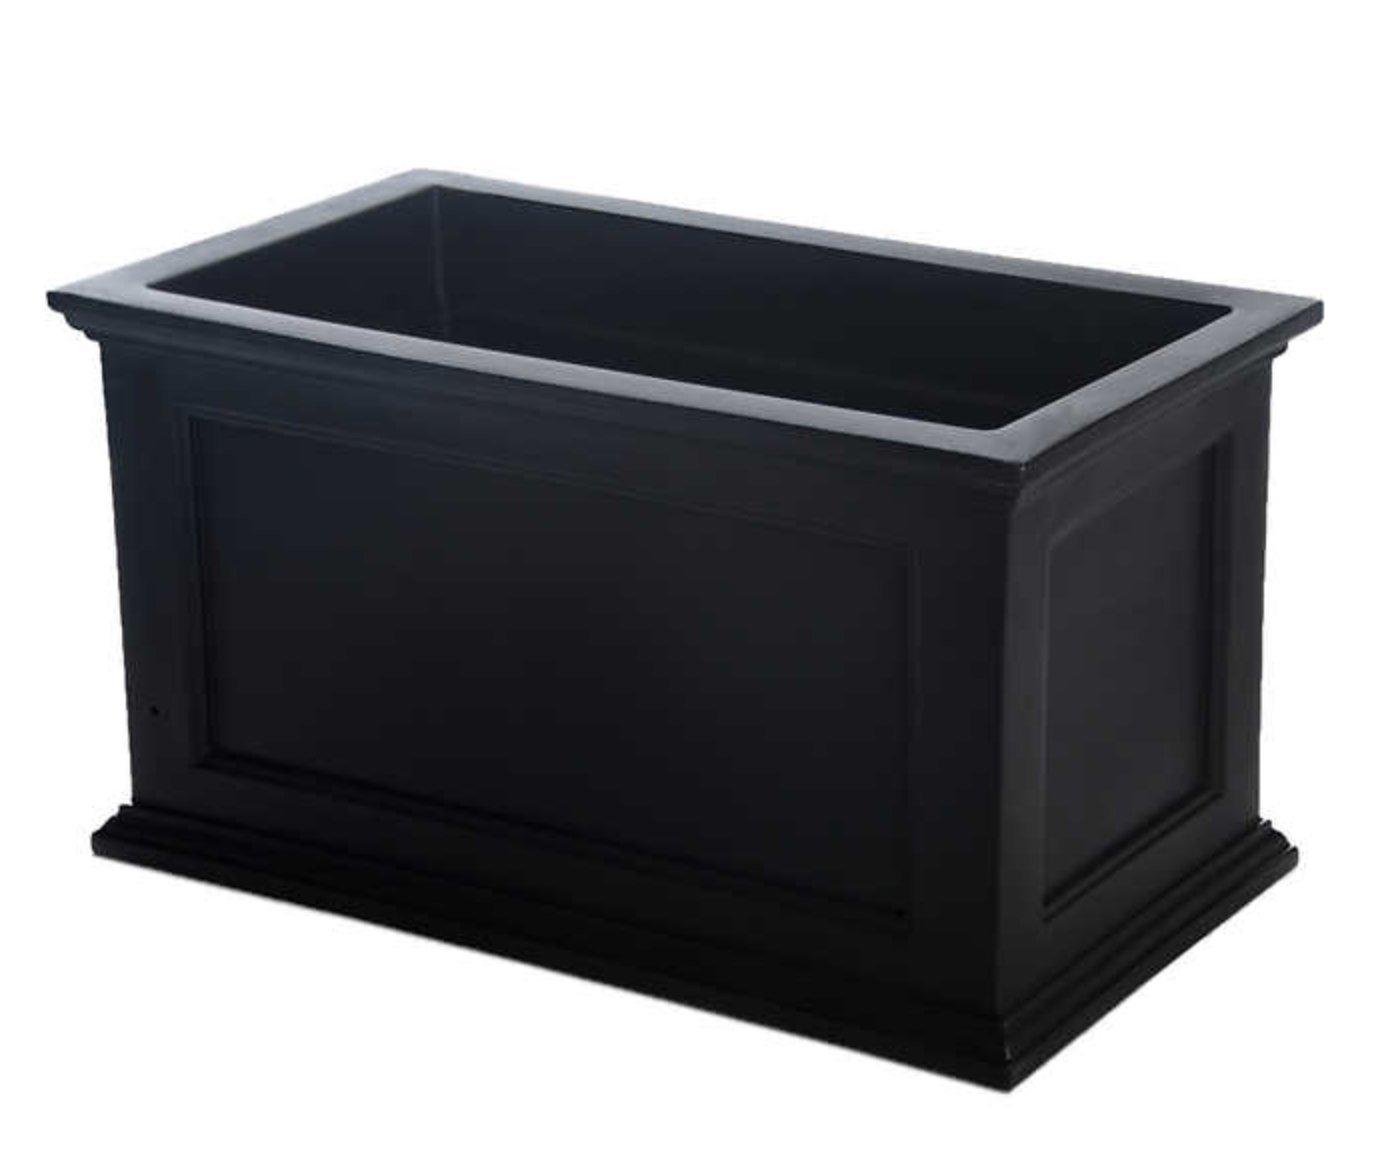 Fairfield Rectangular Window Box Color: Black, Size: 36''